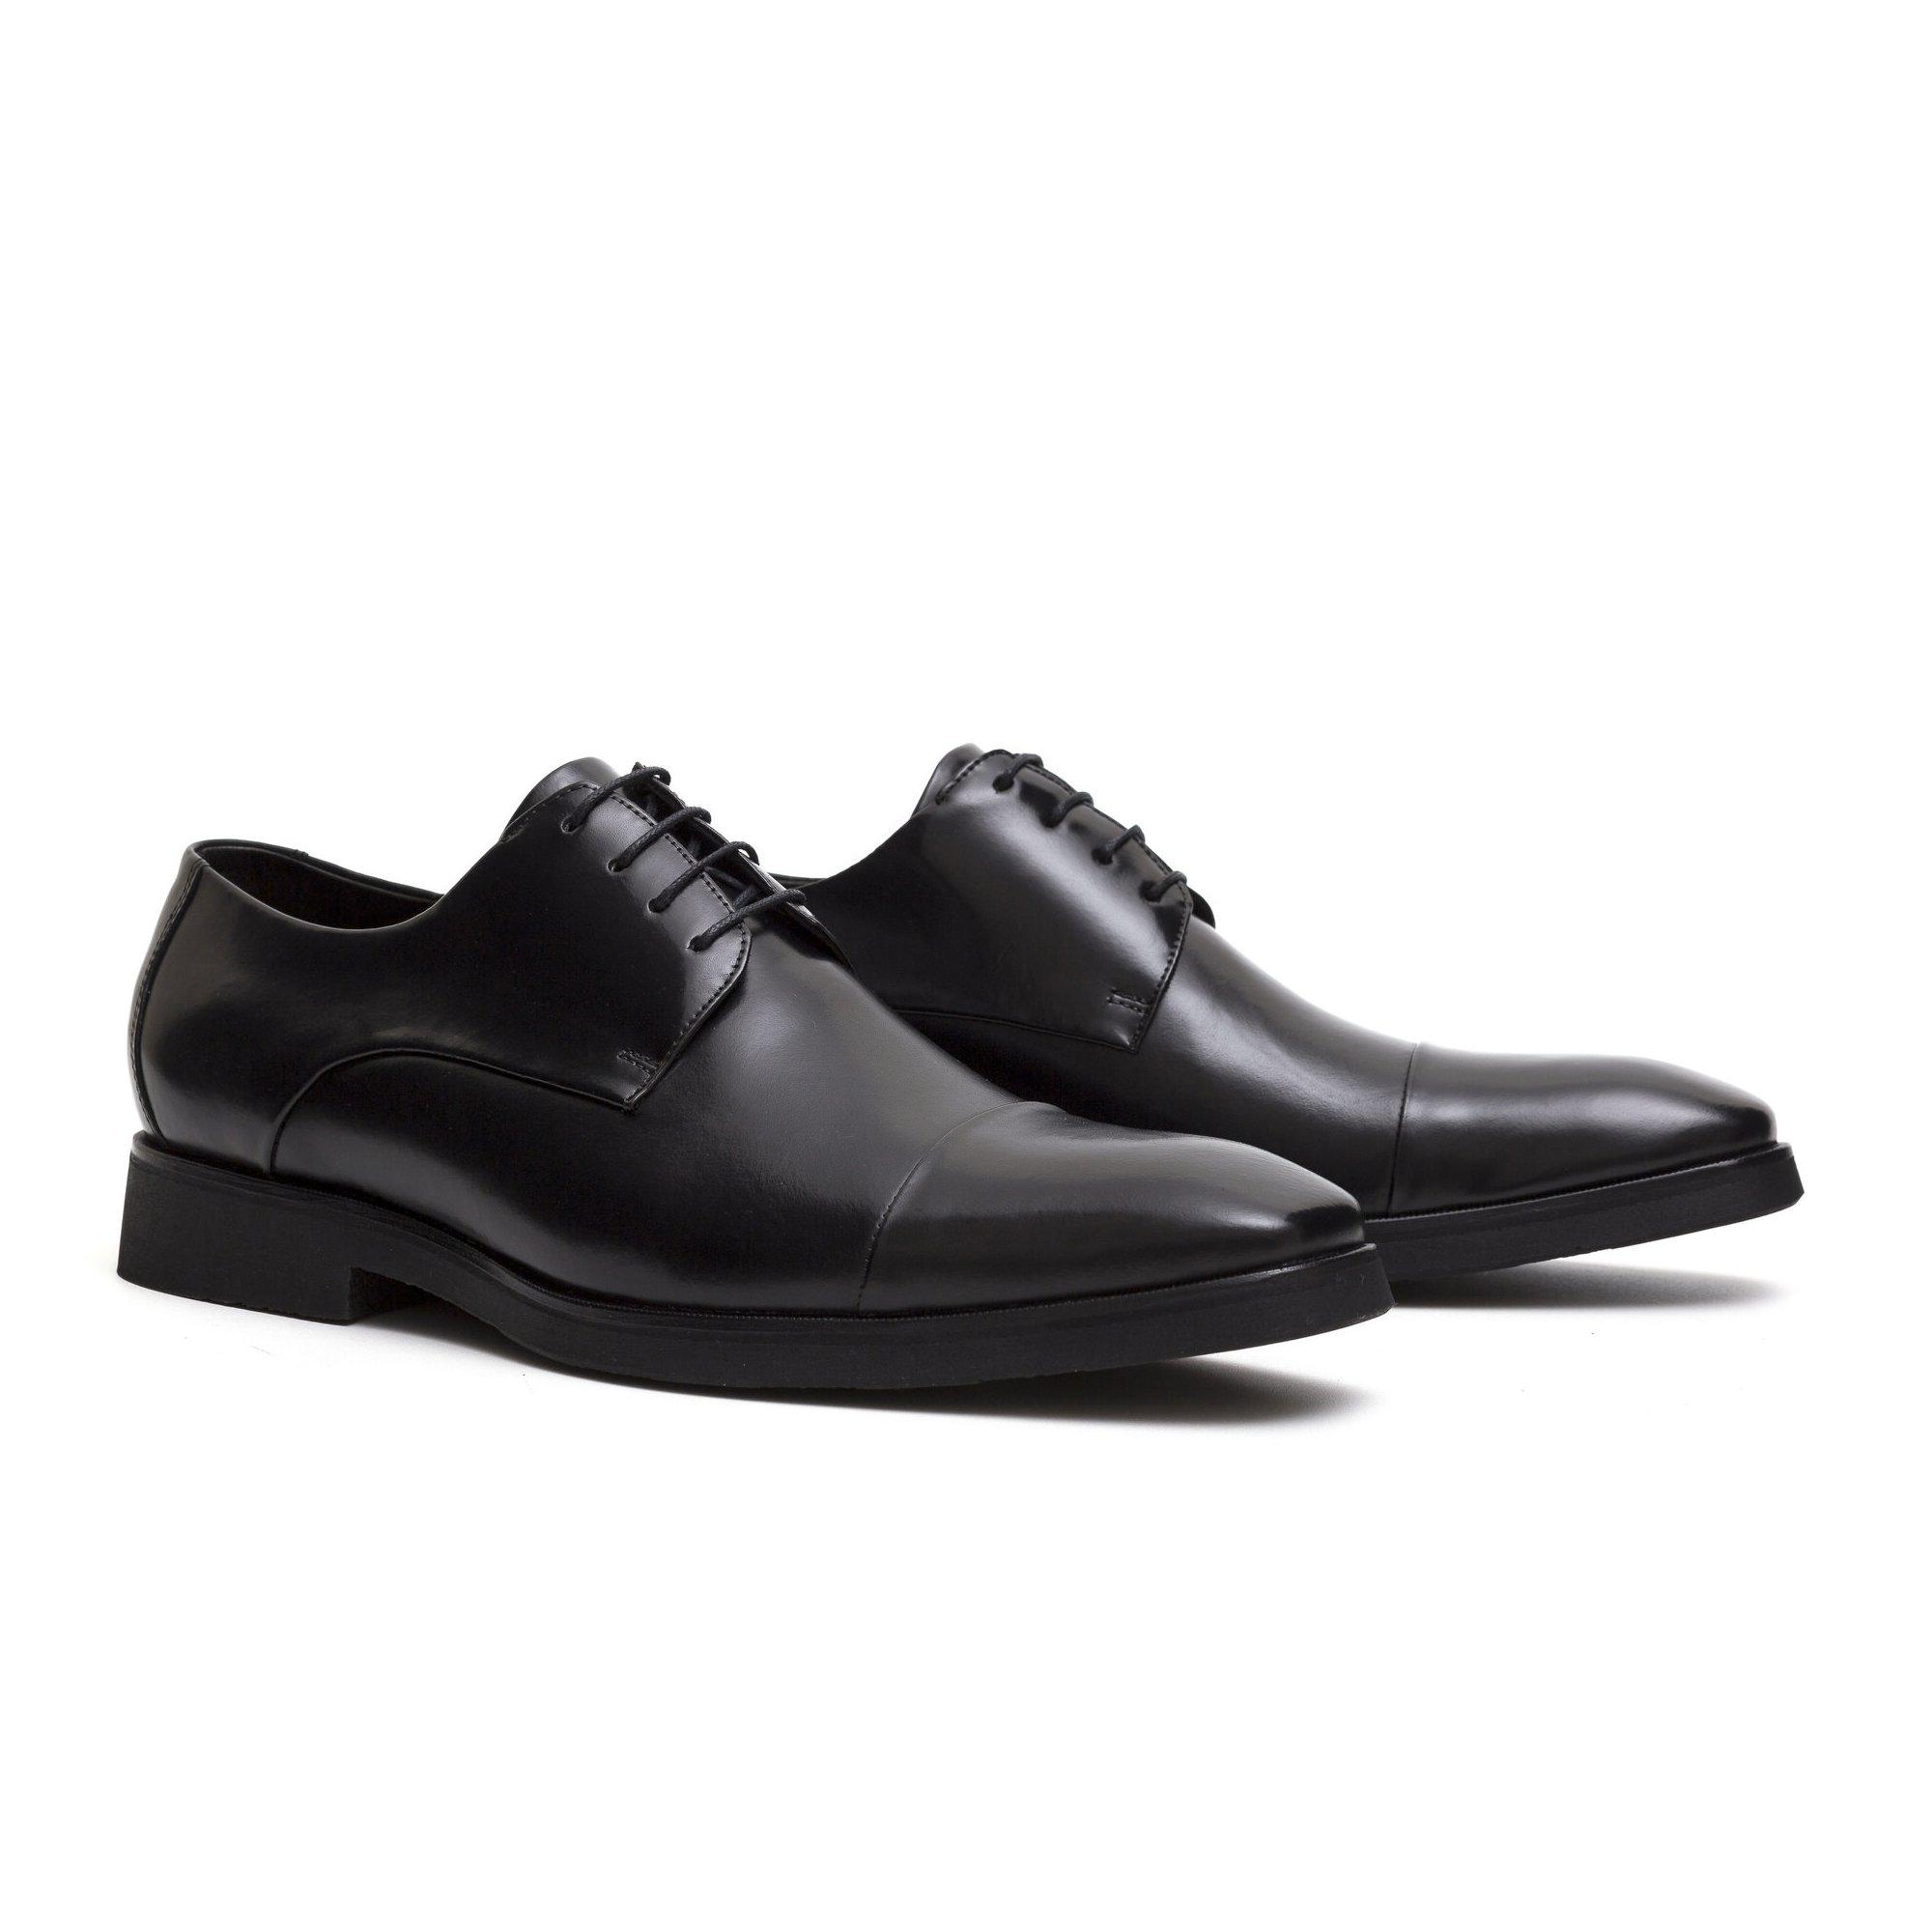 Sapato Social Derby Masculino Preto Couro Legítimo Monbran Dressy James 19100P